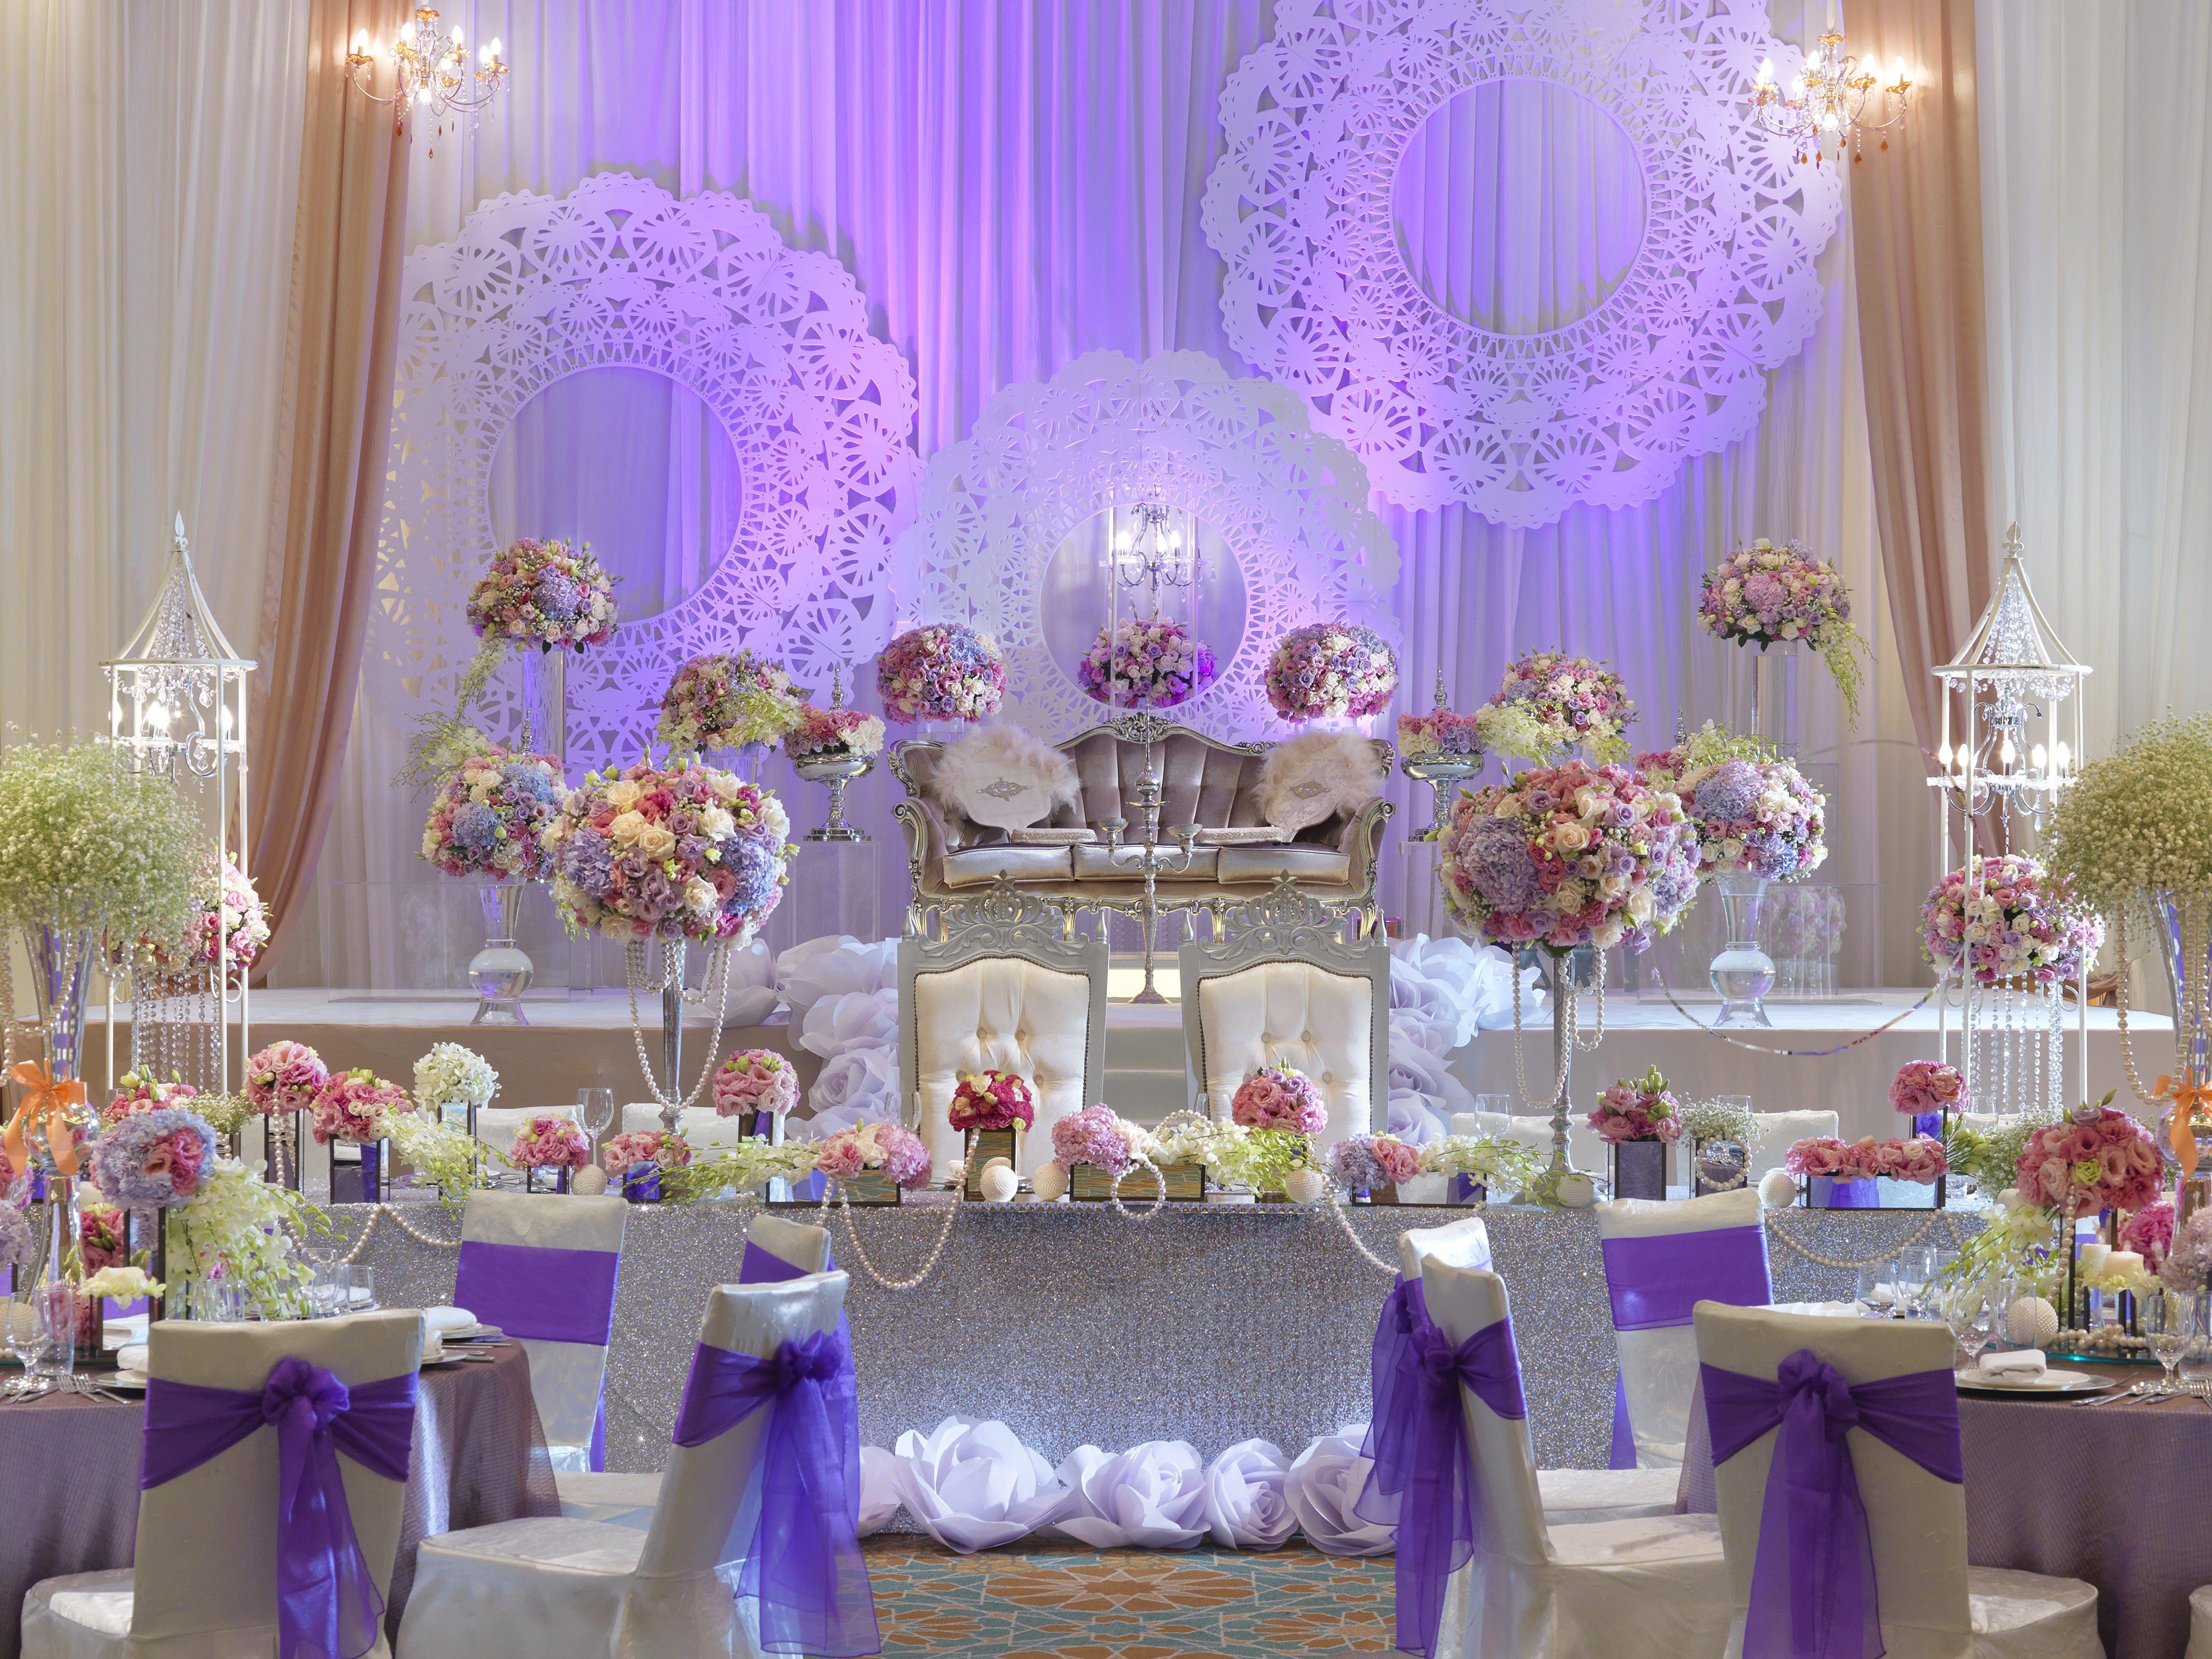 Wedding Gift Ideas Kuala Lumpur : Wedding Venue Kuala Lumpur Mandarin Oriental, Kuala Lumpur